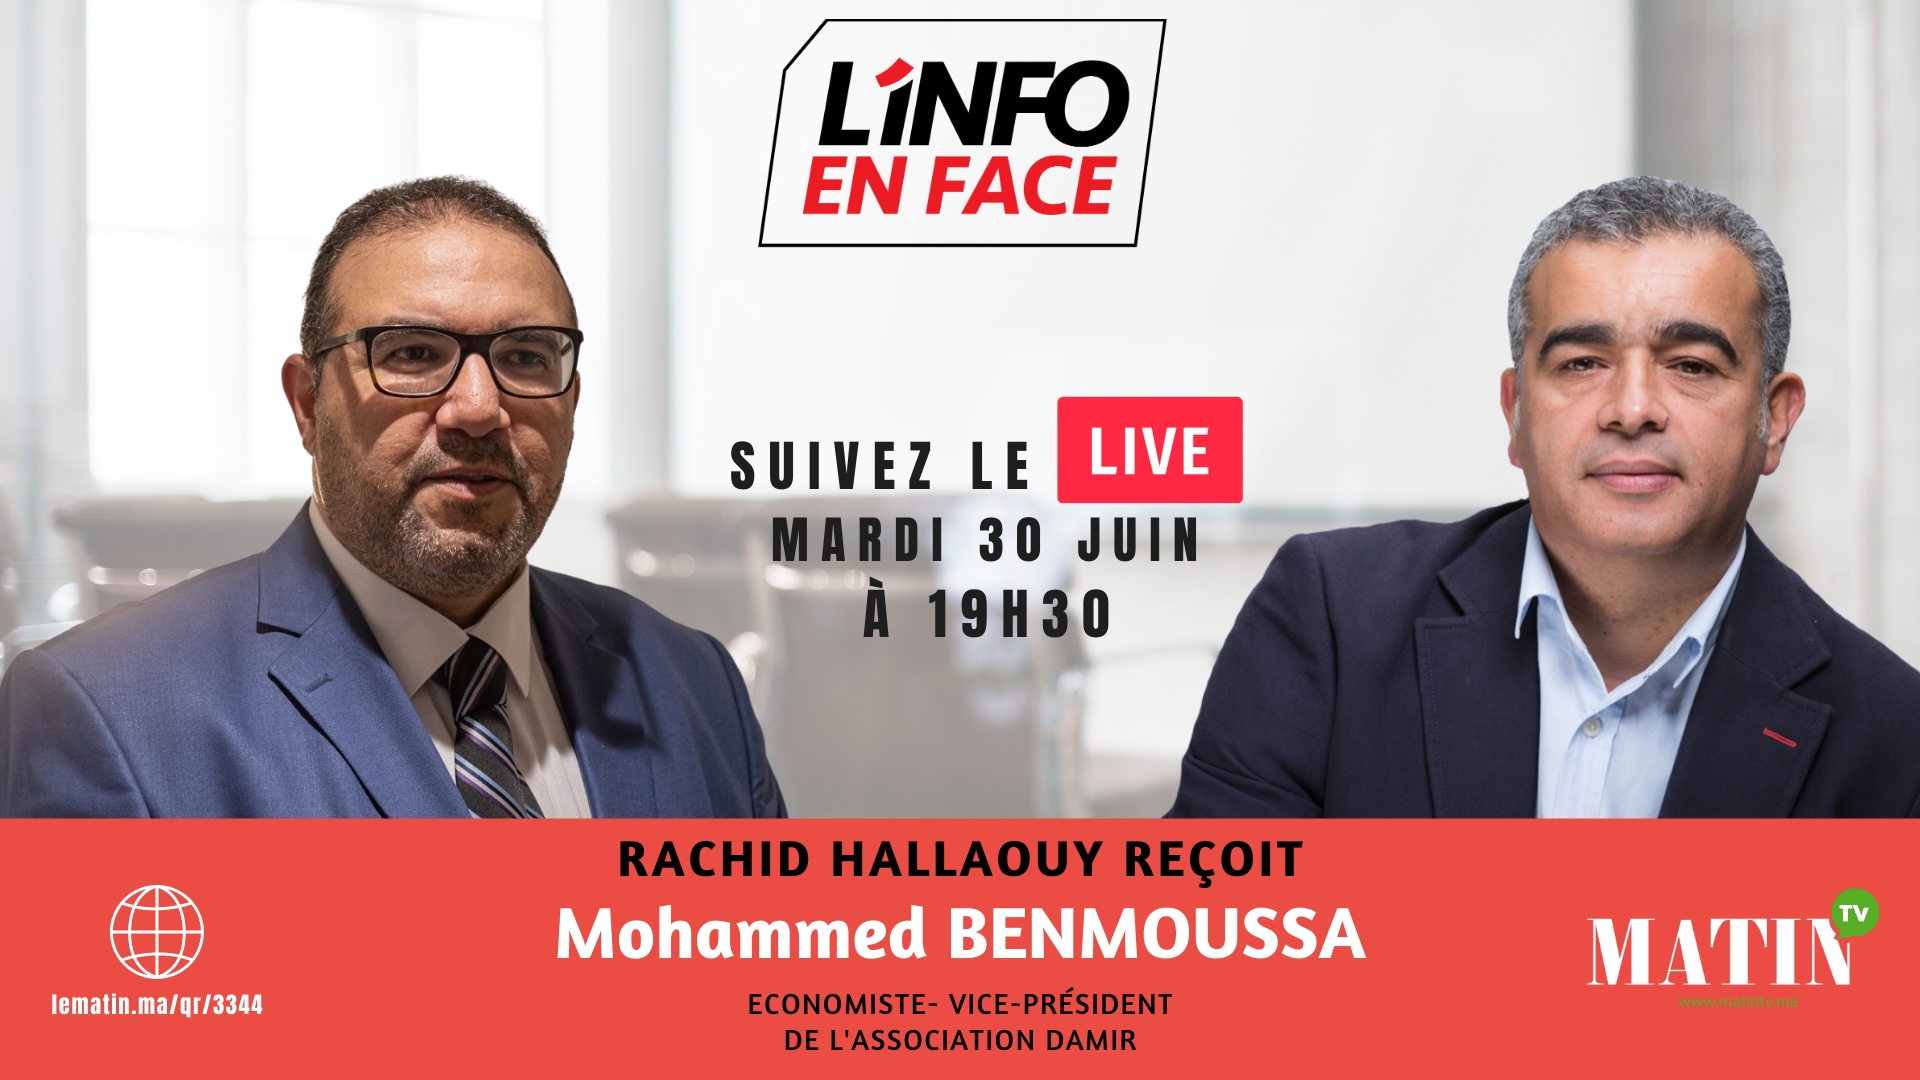 Live : L'Info en Face avec Mohammed Benmoussa